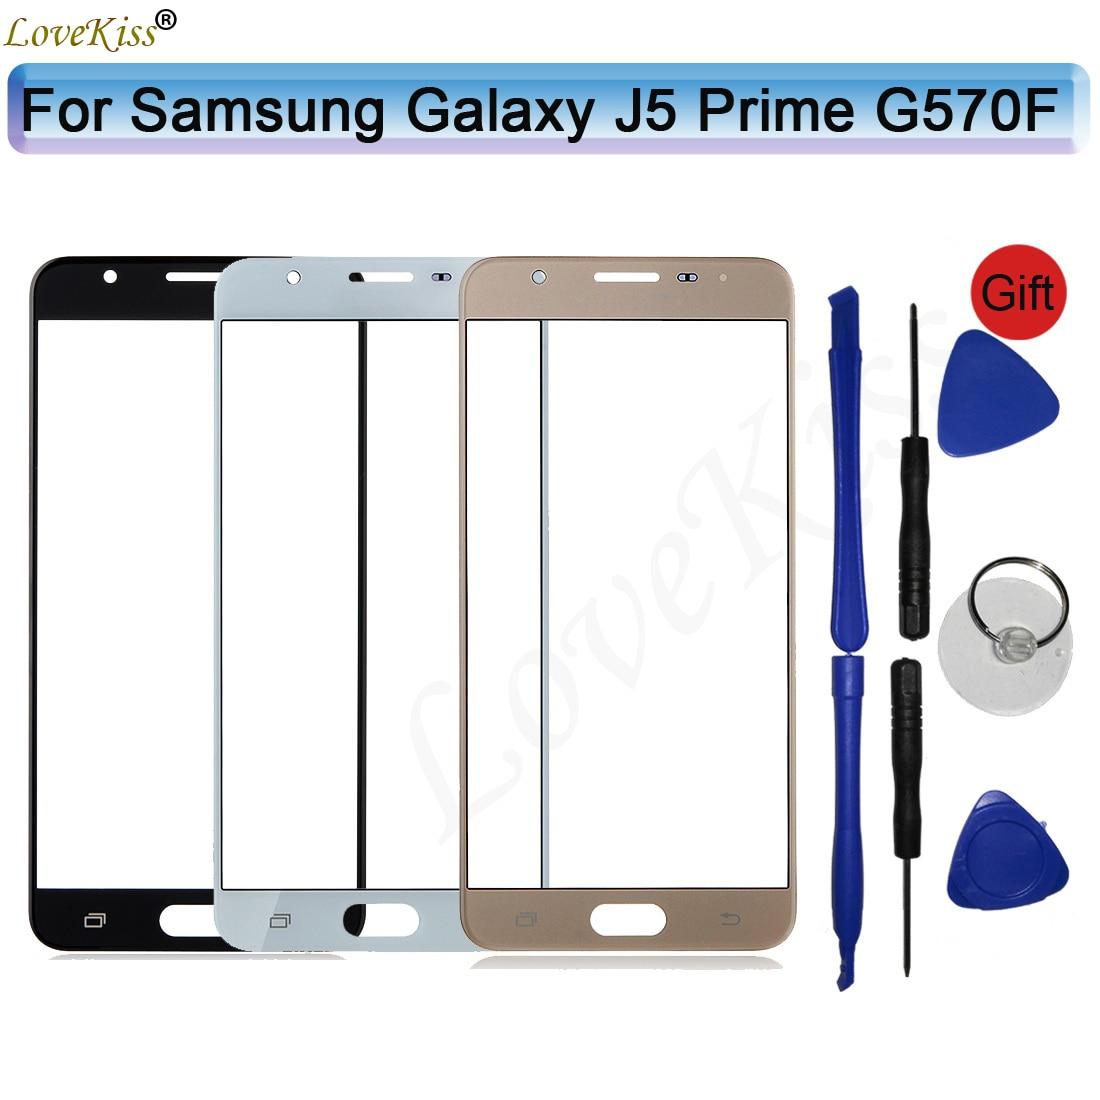 Для Samsung Galaxy J5 Prime J5Prime G570F On5 2016 G570 сенсорный экран Объектив ЖК-дисплей передняя стеклянная панель Крышка Замена